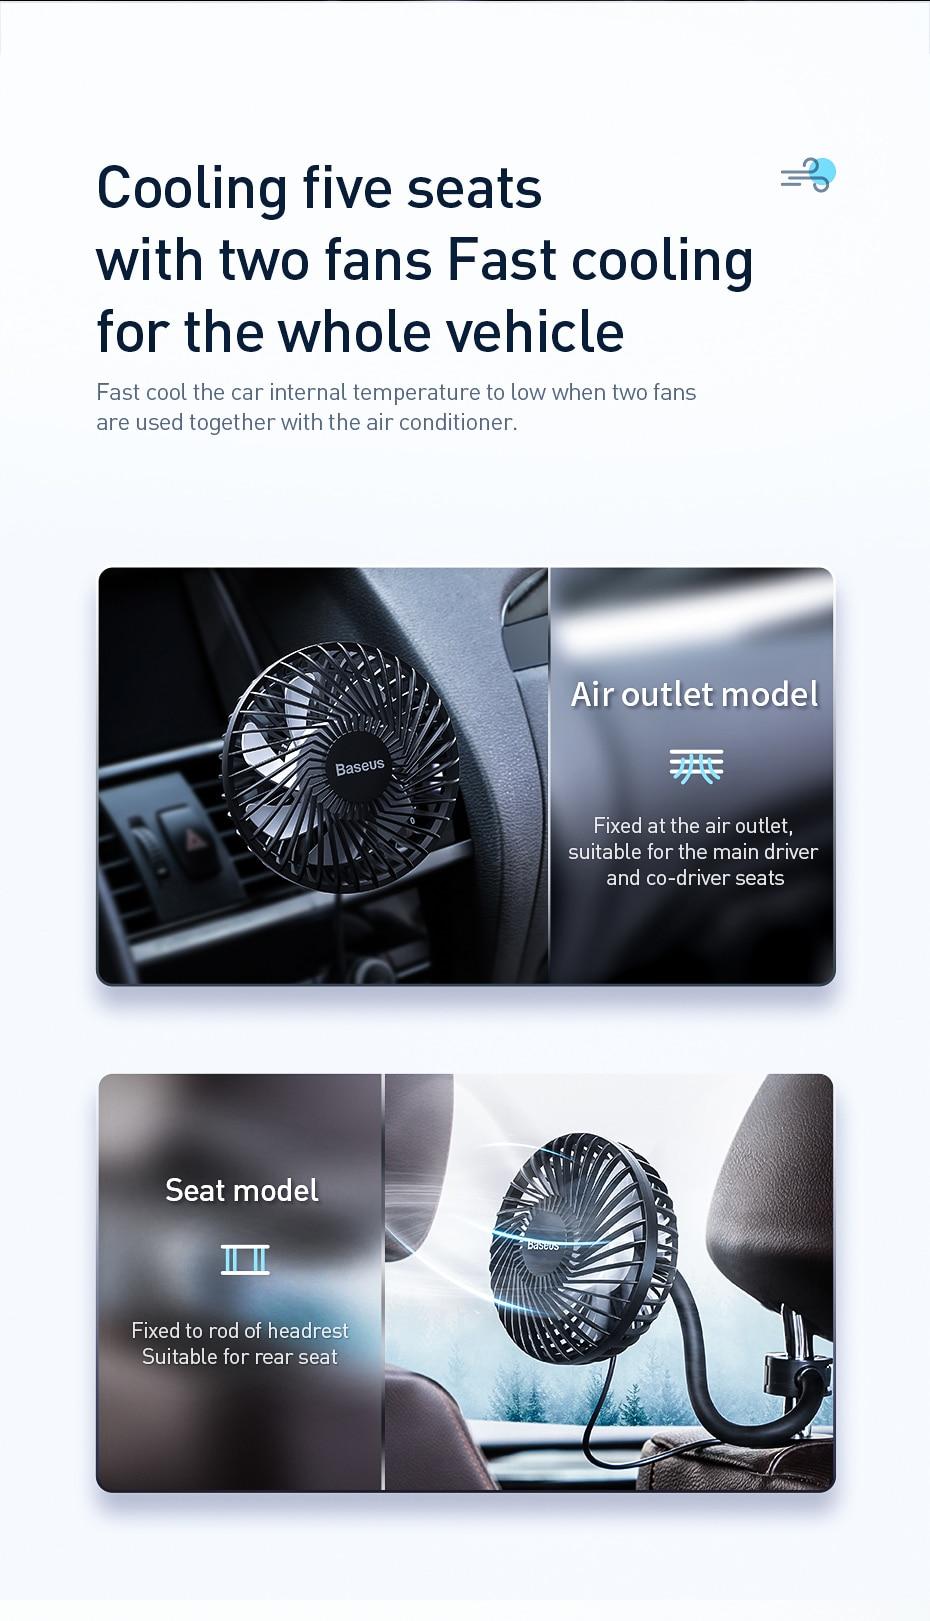 Baseus Air Vent Mounted USB Fan 3 Speed Air Cooling Fan For Car Air 2